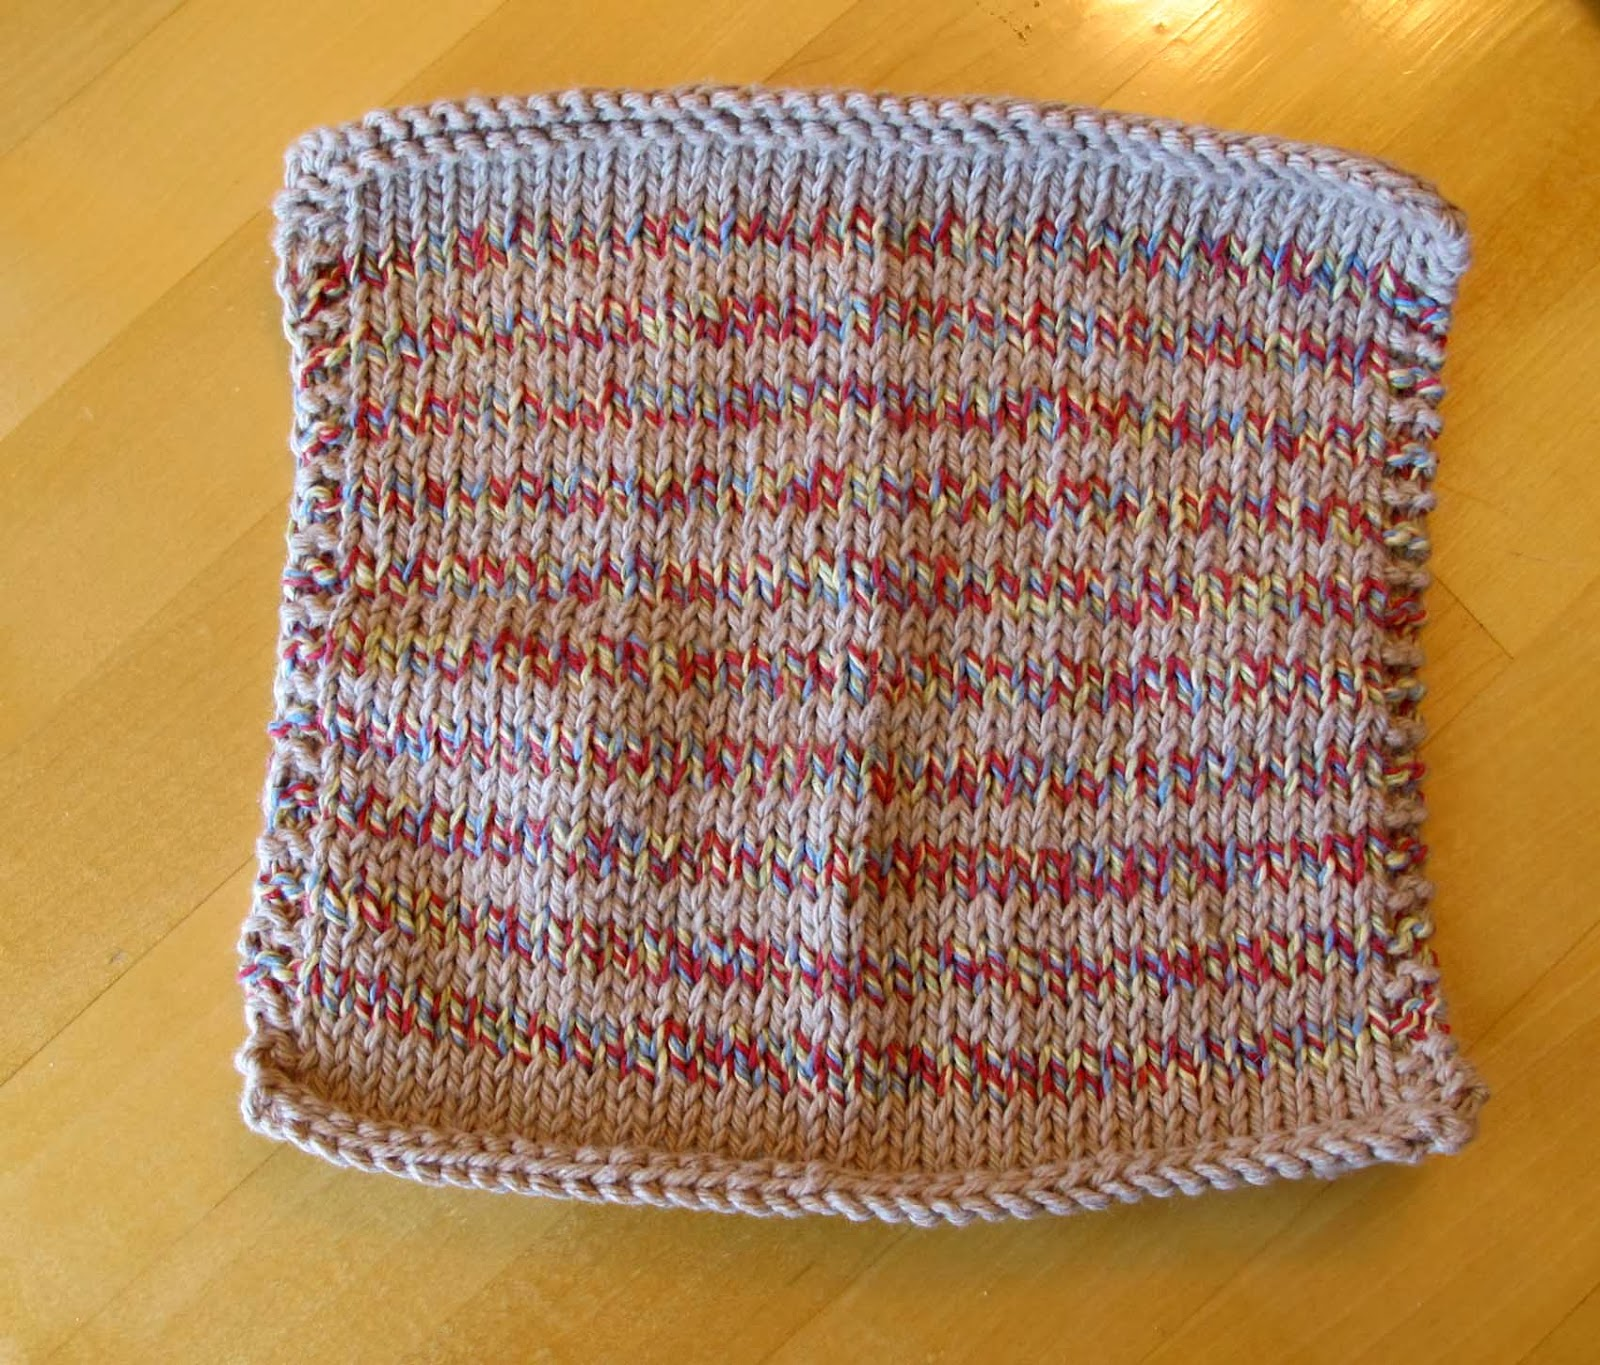 Farmhouse Kitchen Knitted Dishcloth: T. Matthews Fine Art: Knitting Journal